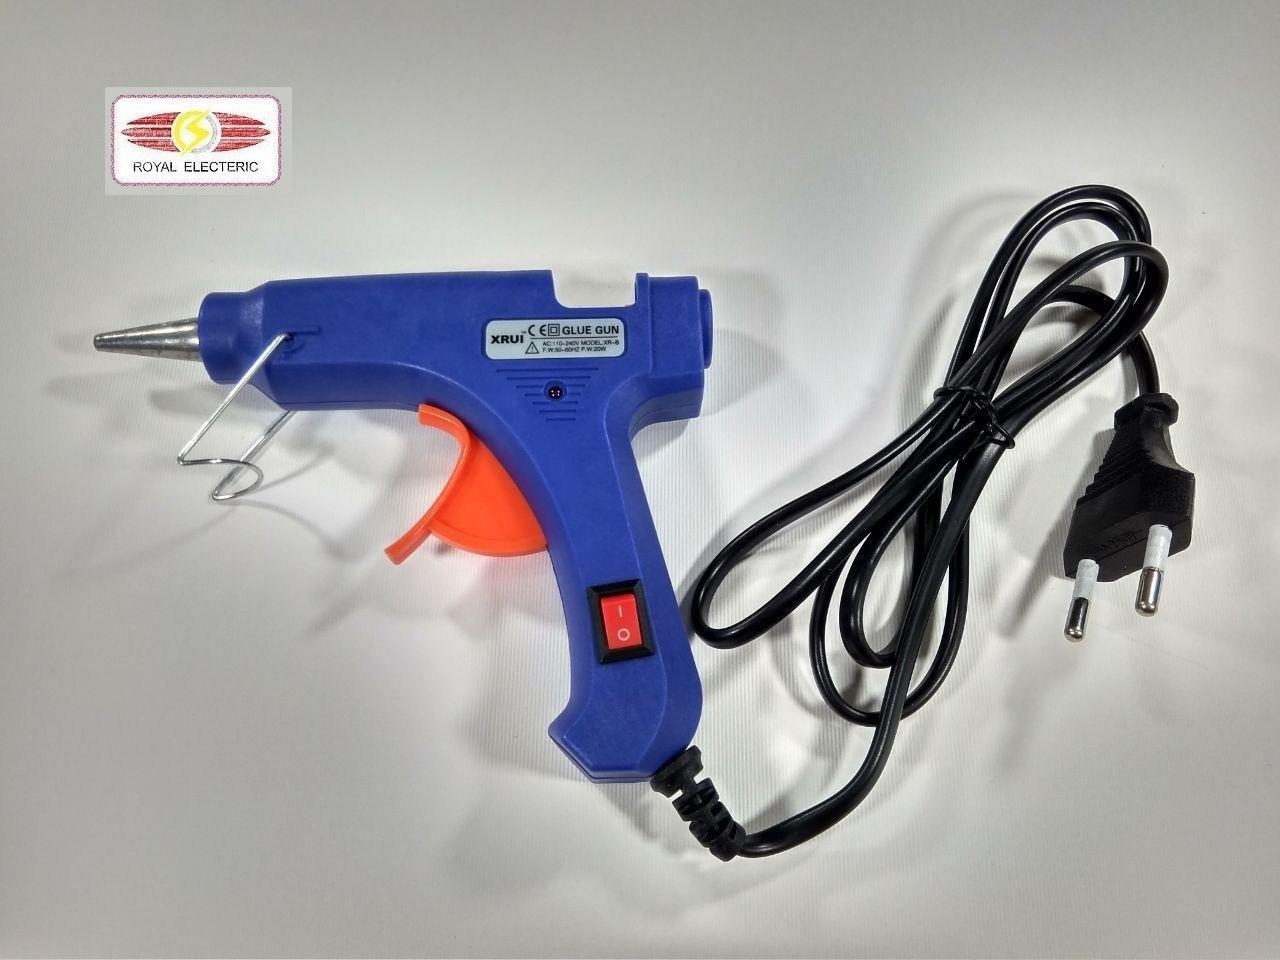 عکس چسب تفنگی ایکس روی مدل E20W  چسب-تفنگی-ایکس-روی-مدل-e20w